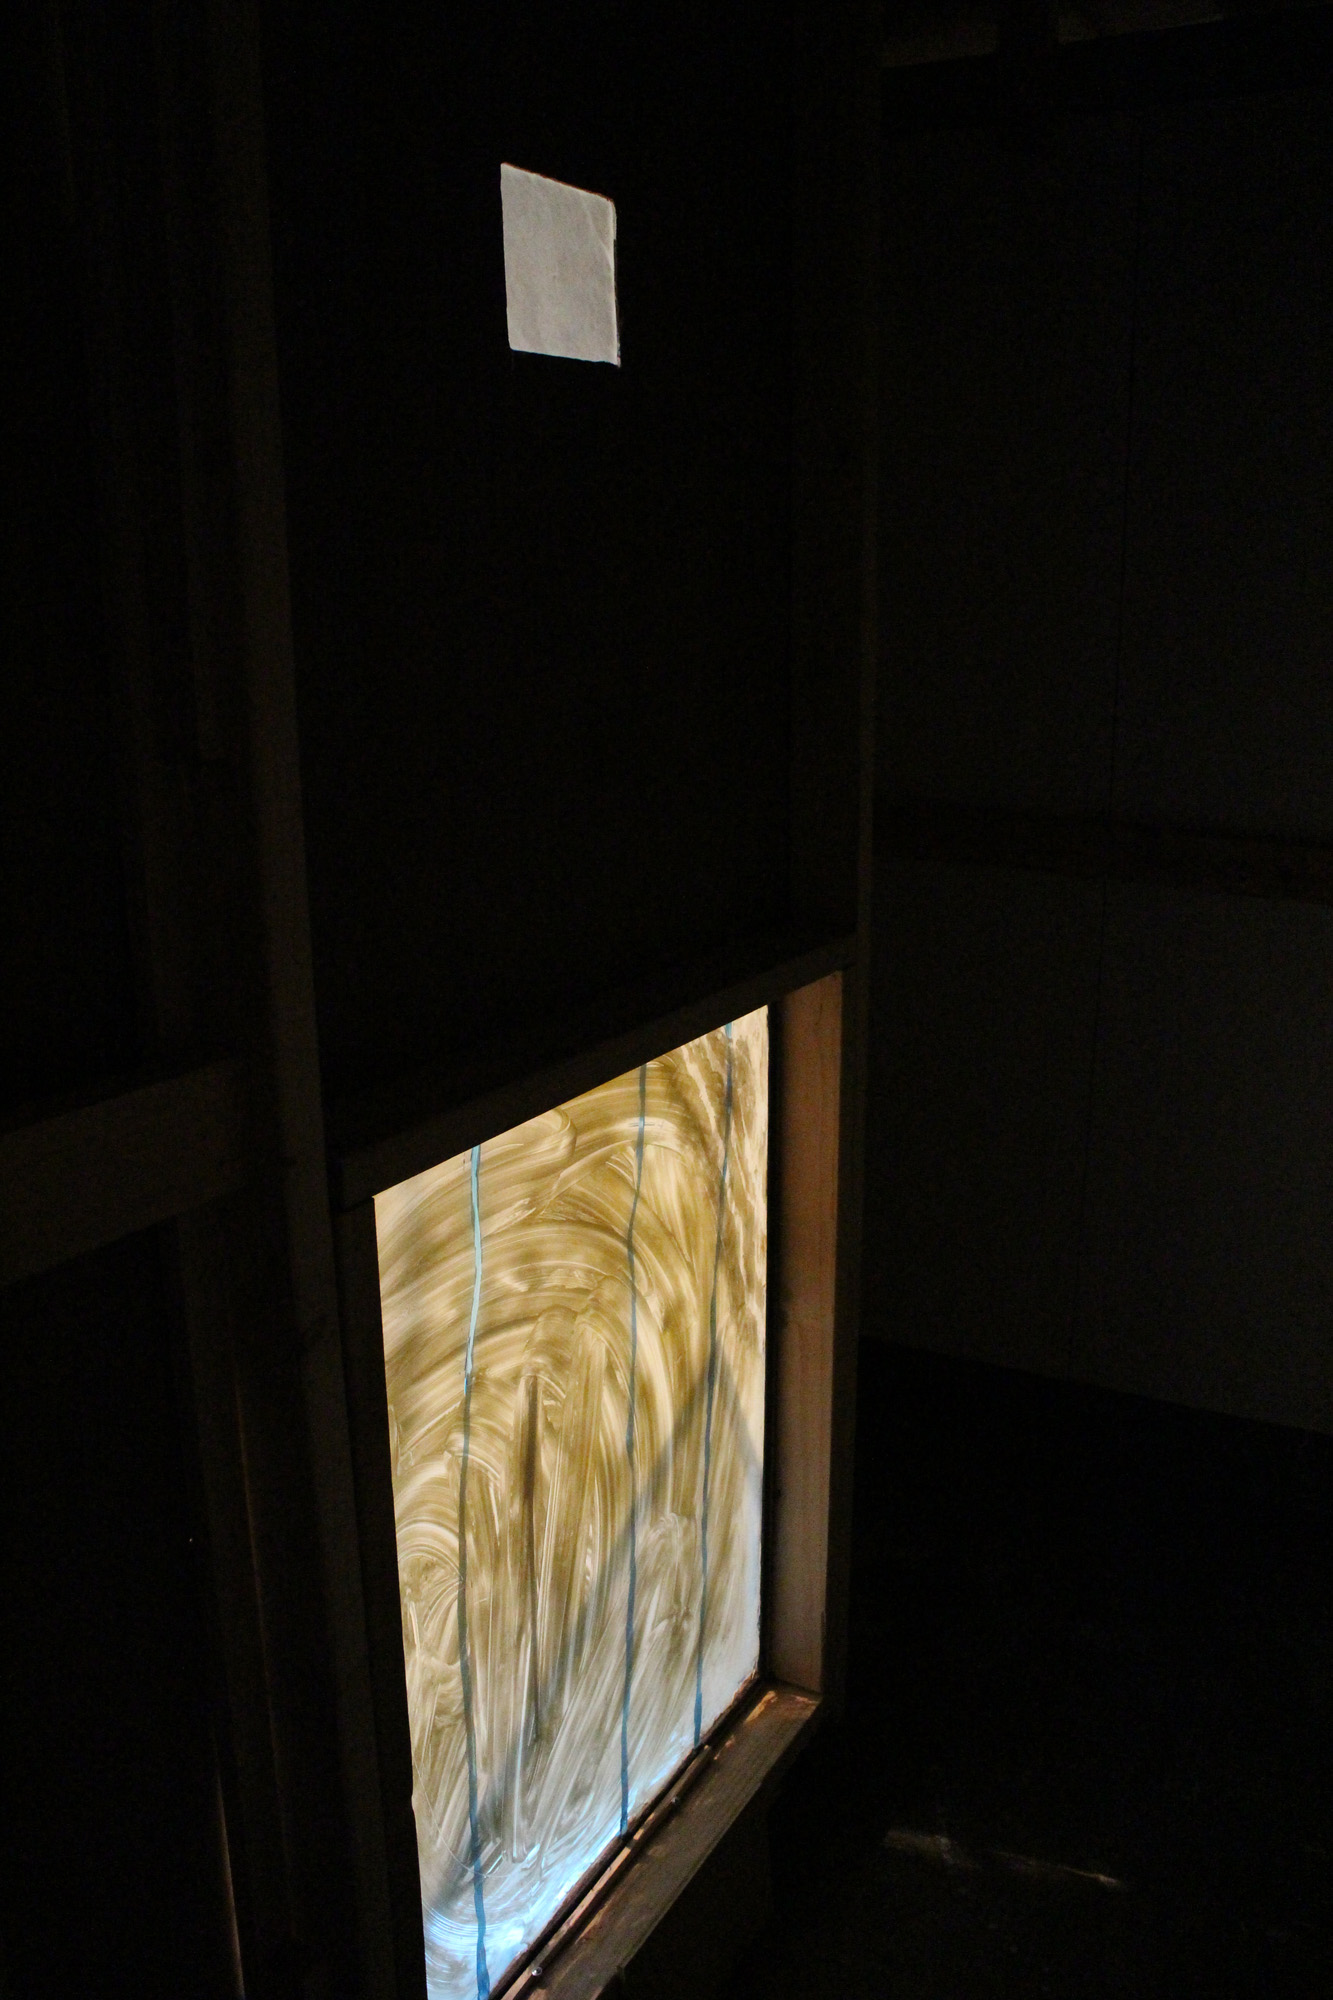 prozor.jpg